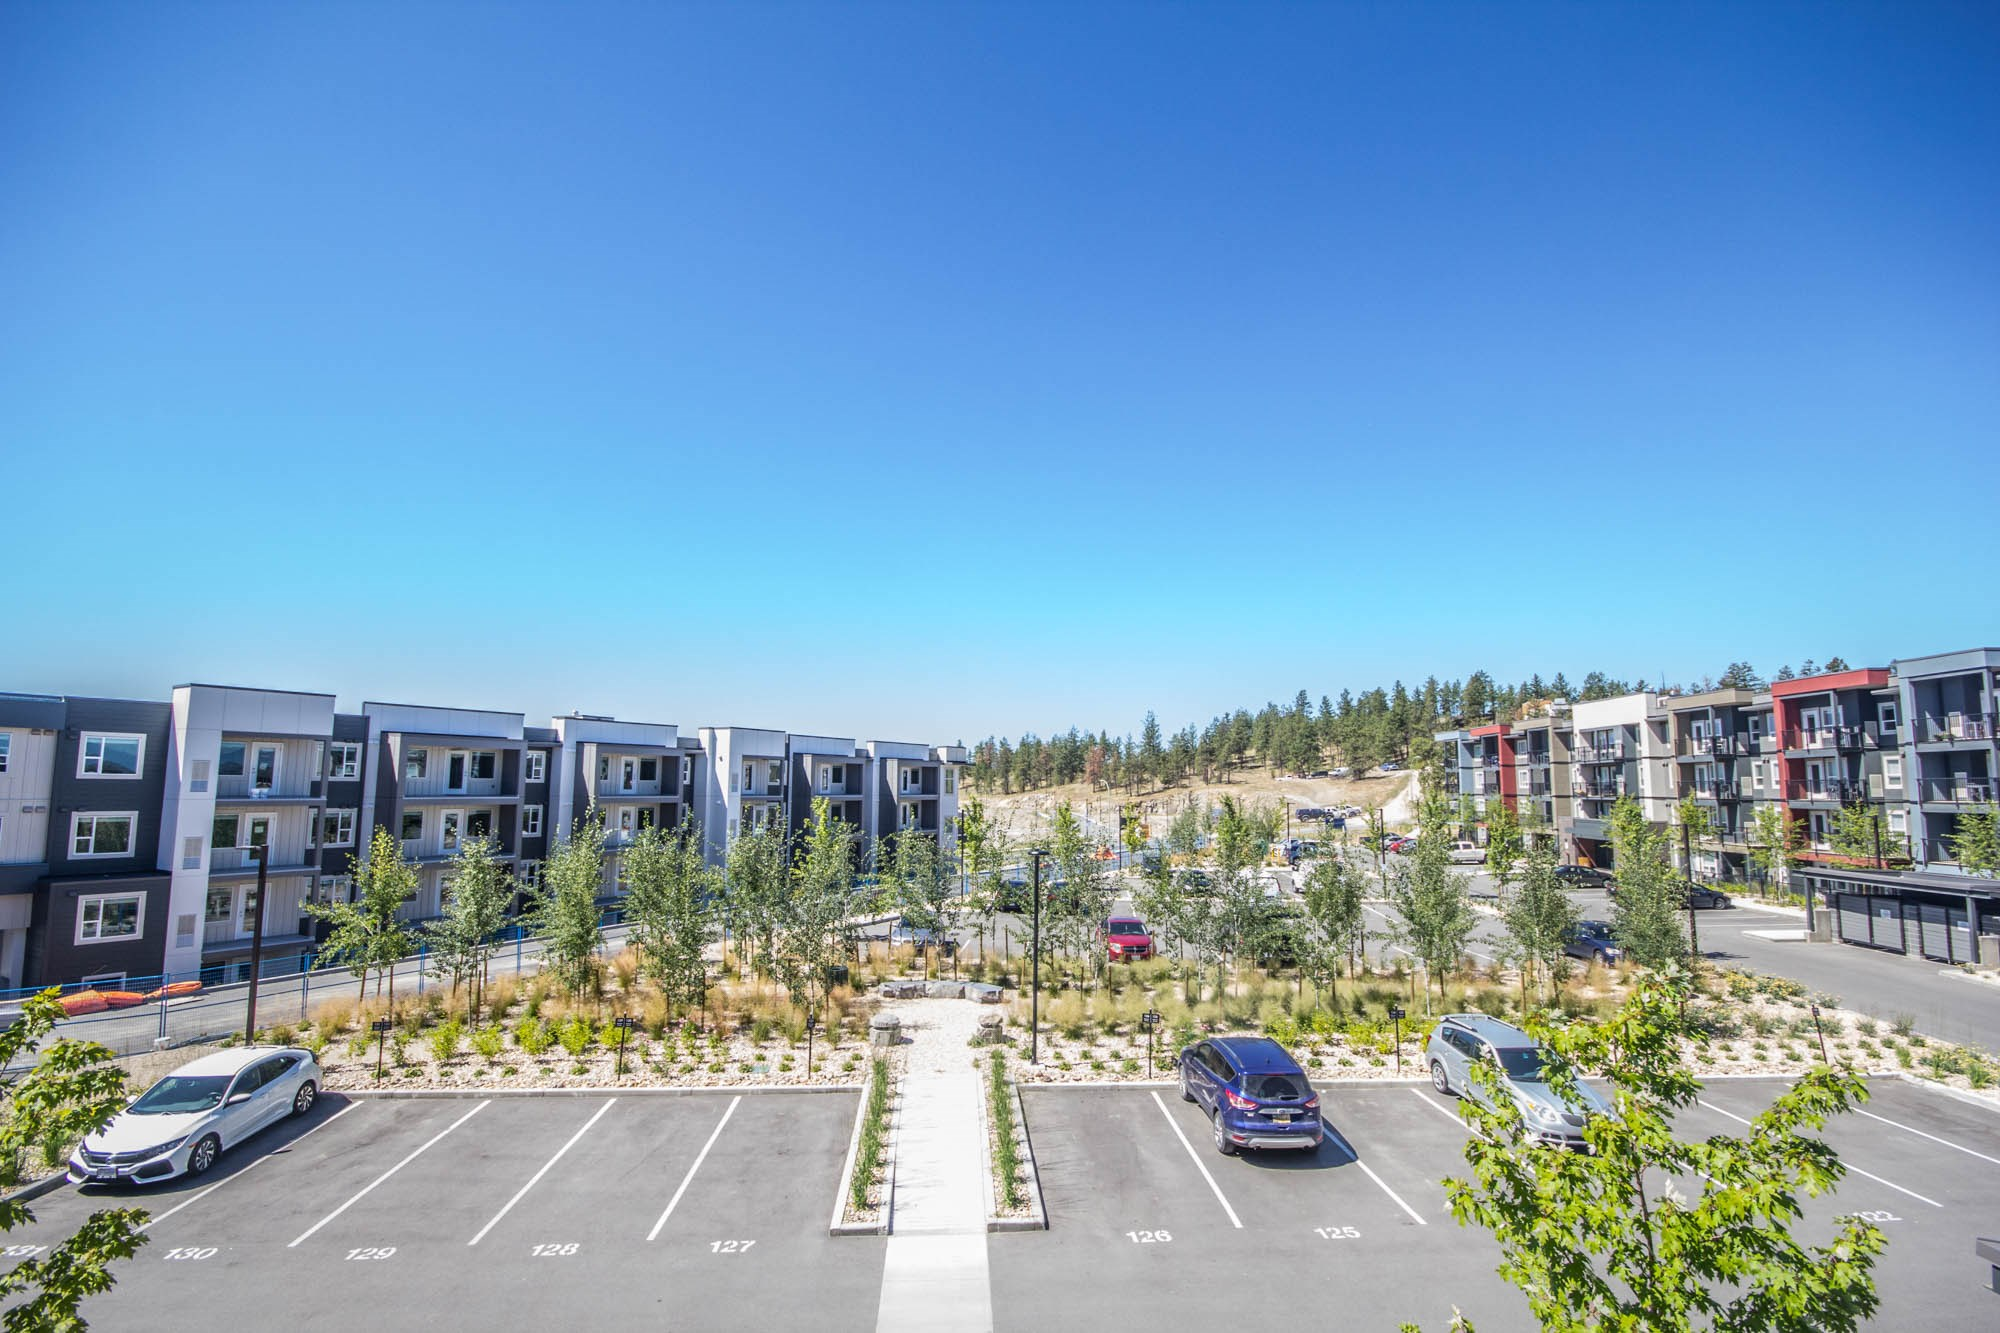 775-academy-way-u-three-ubco-kelowna-investment-property-parking-lot.Jpg